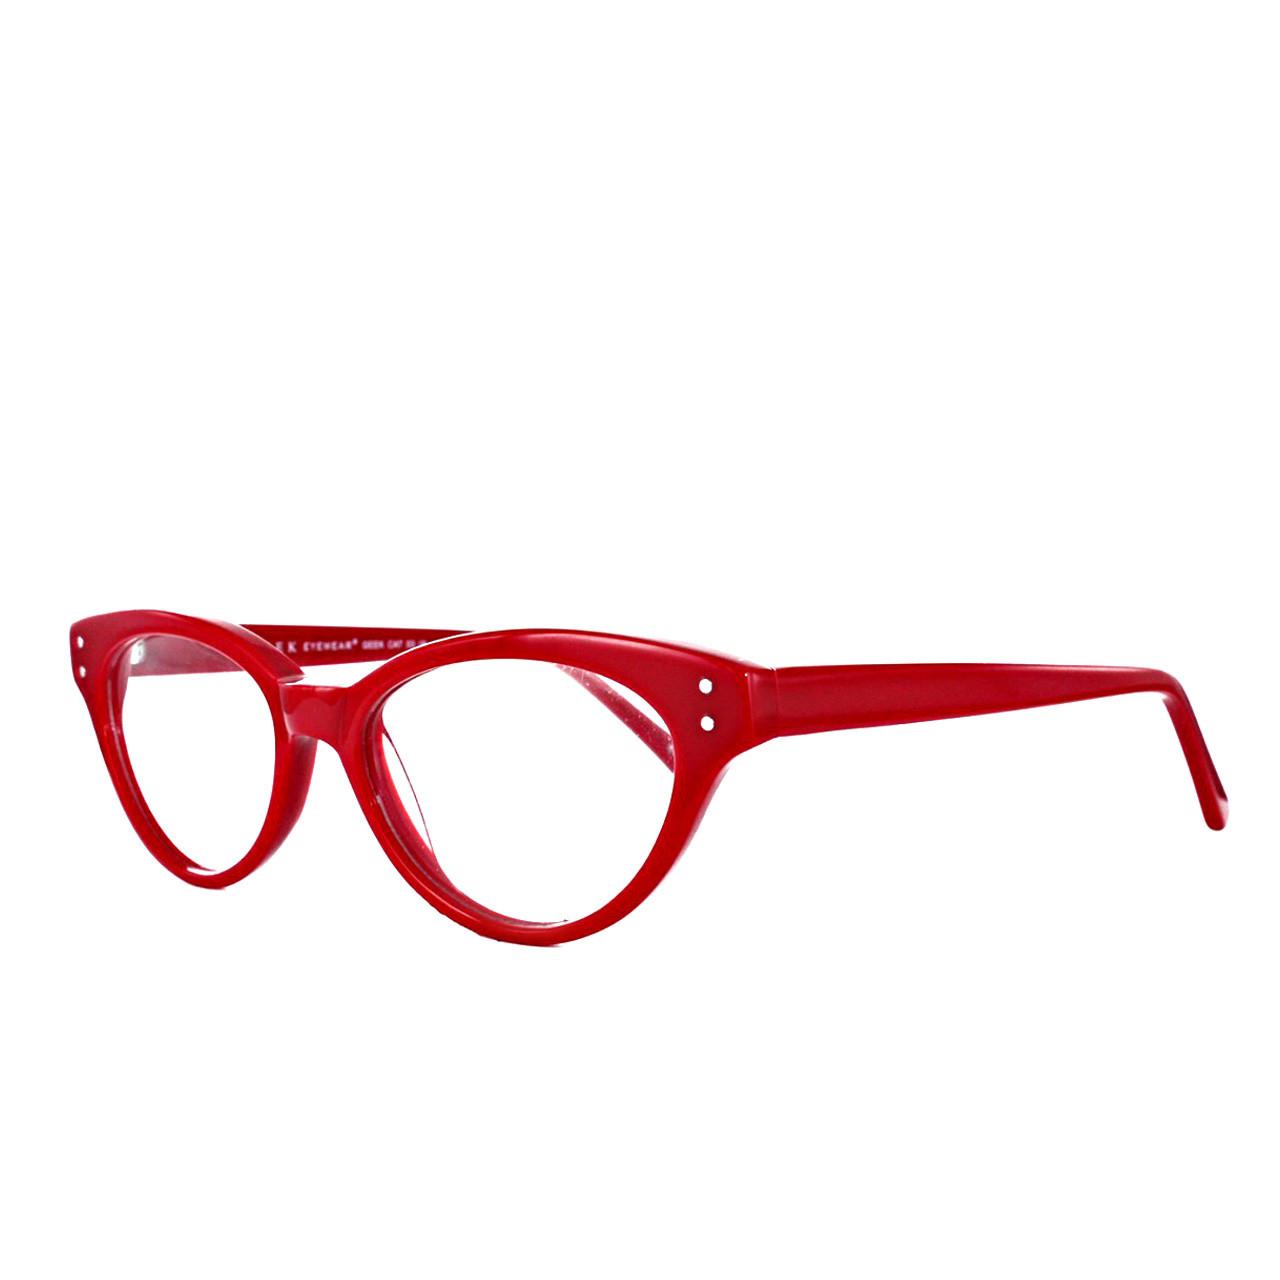 GEEK Eyewear GEEK CAT 03 Red